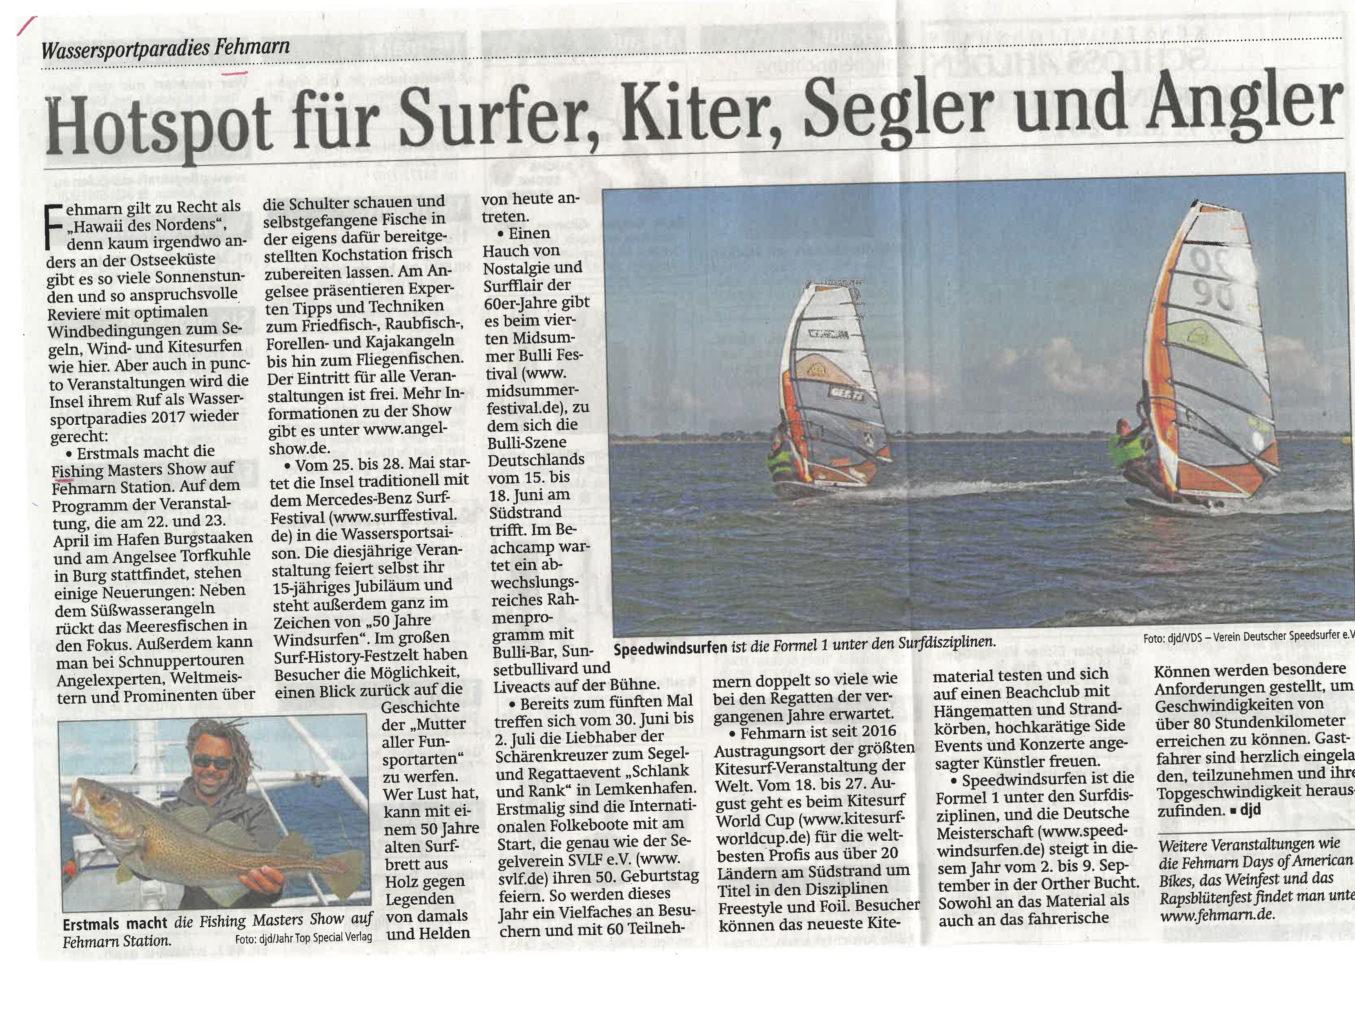 Hotspot für Surfer, Kiter, Segler und Angler